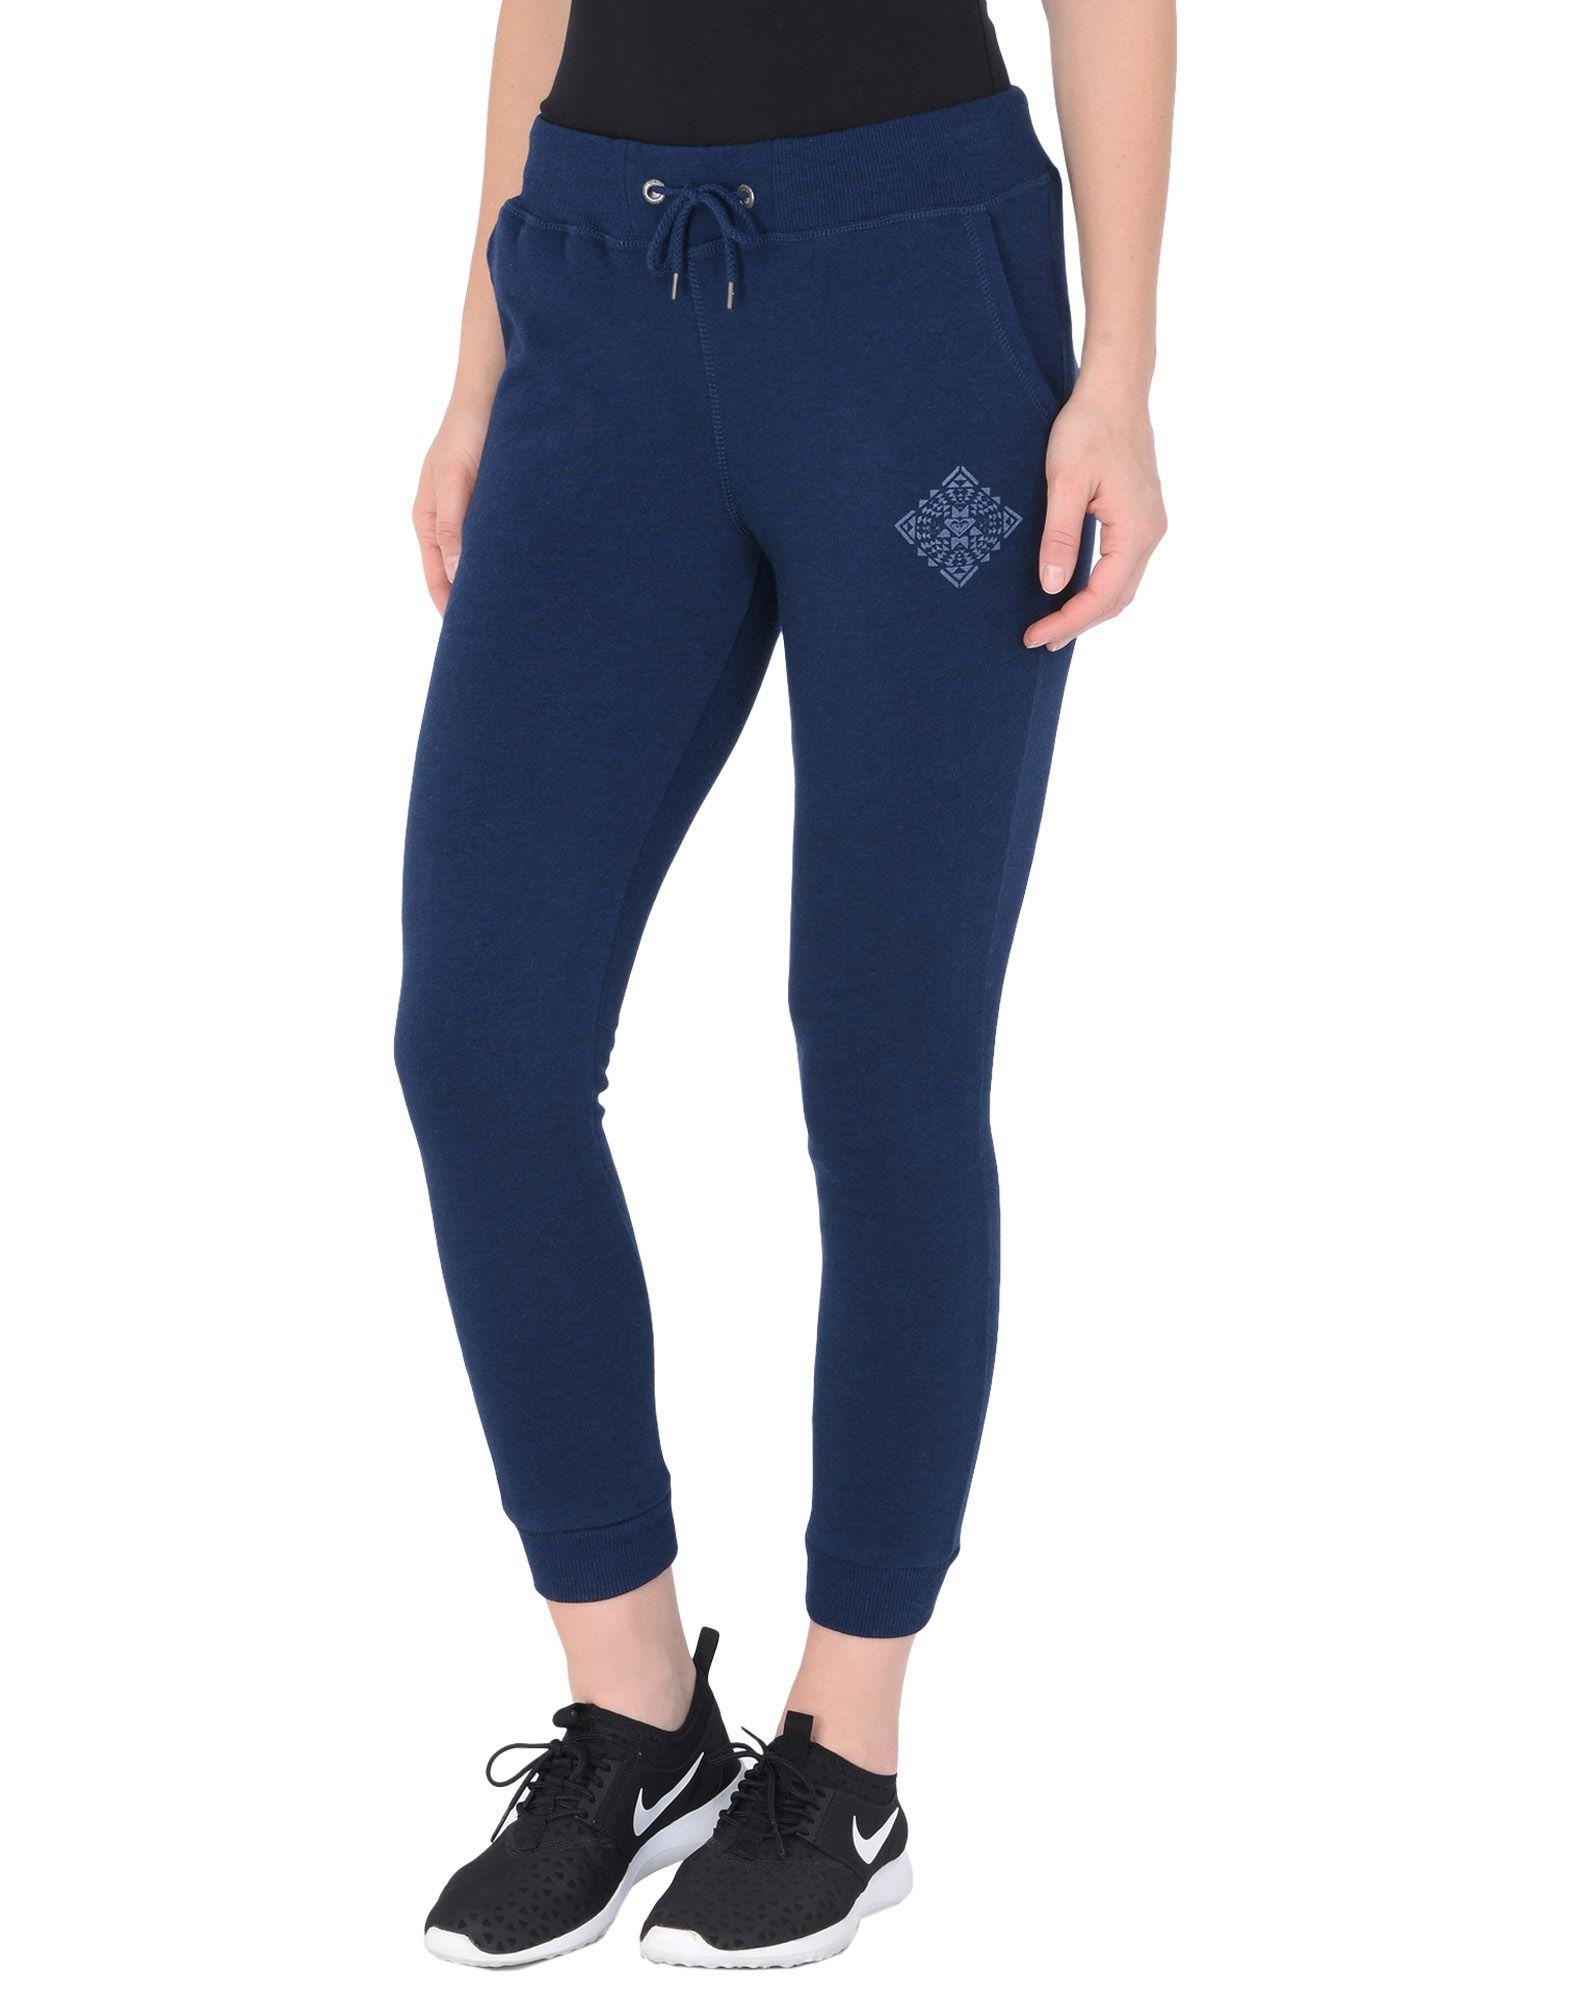 ROXY Повседневные брюки roxy брюки roxy backyard pt j snpt wbb0 сноубордические женские bright white m